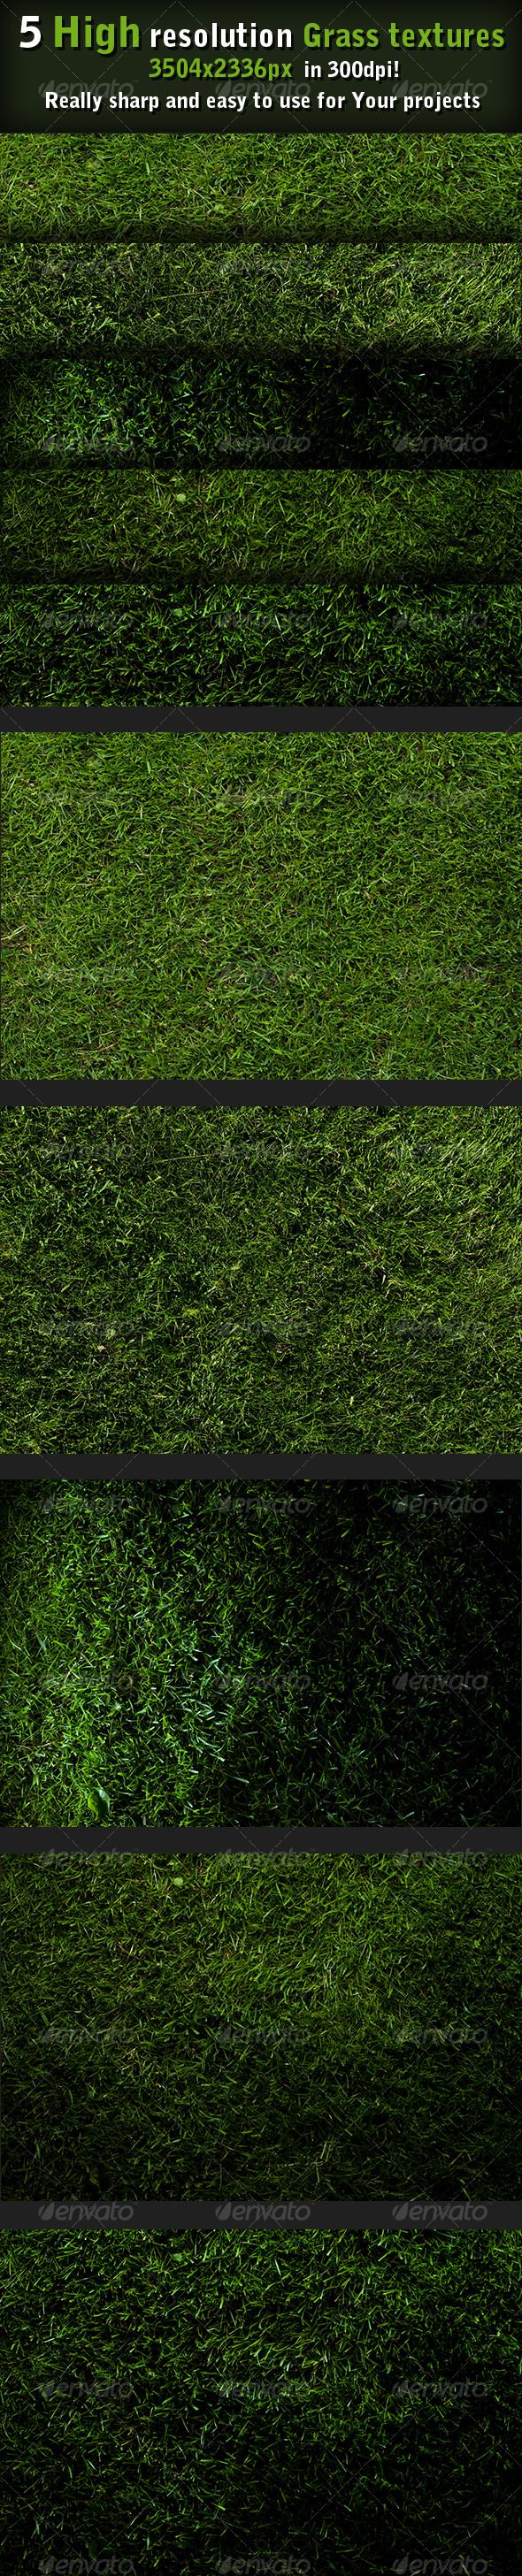 GraphicRiver 5 Grass textures high resolution 92639